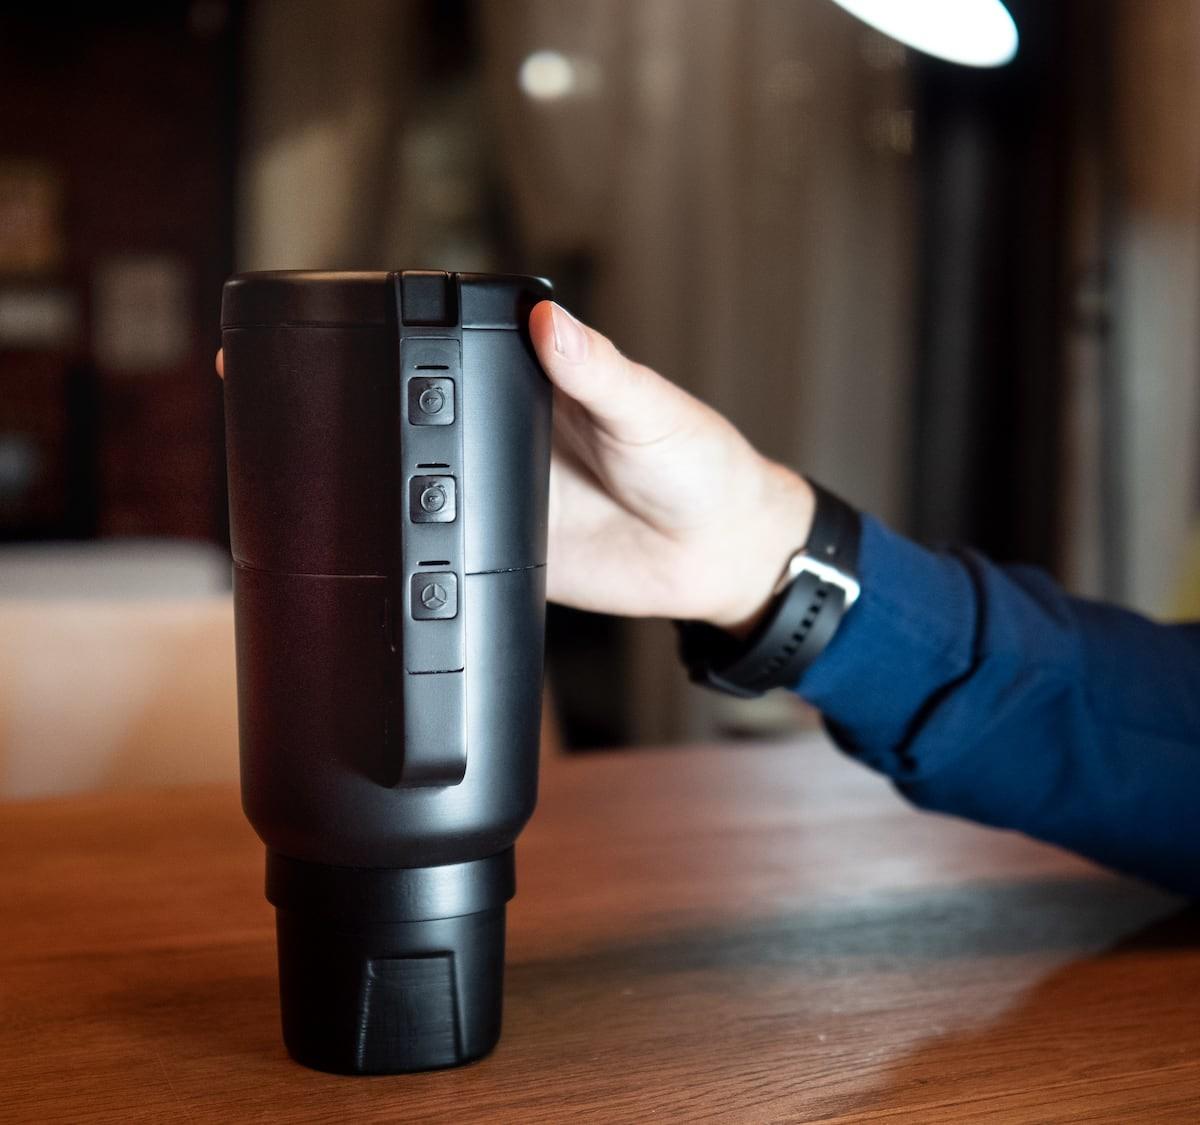 DisMug disinfecting device is a stylish mug with advanced UV-light tech disinfection